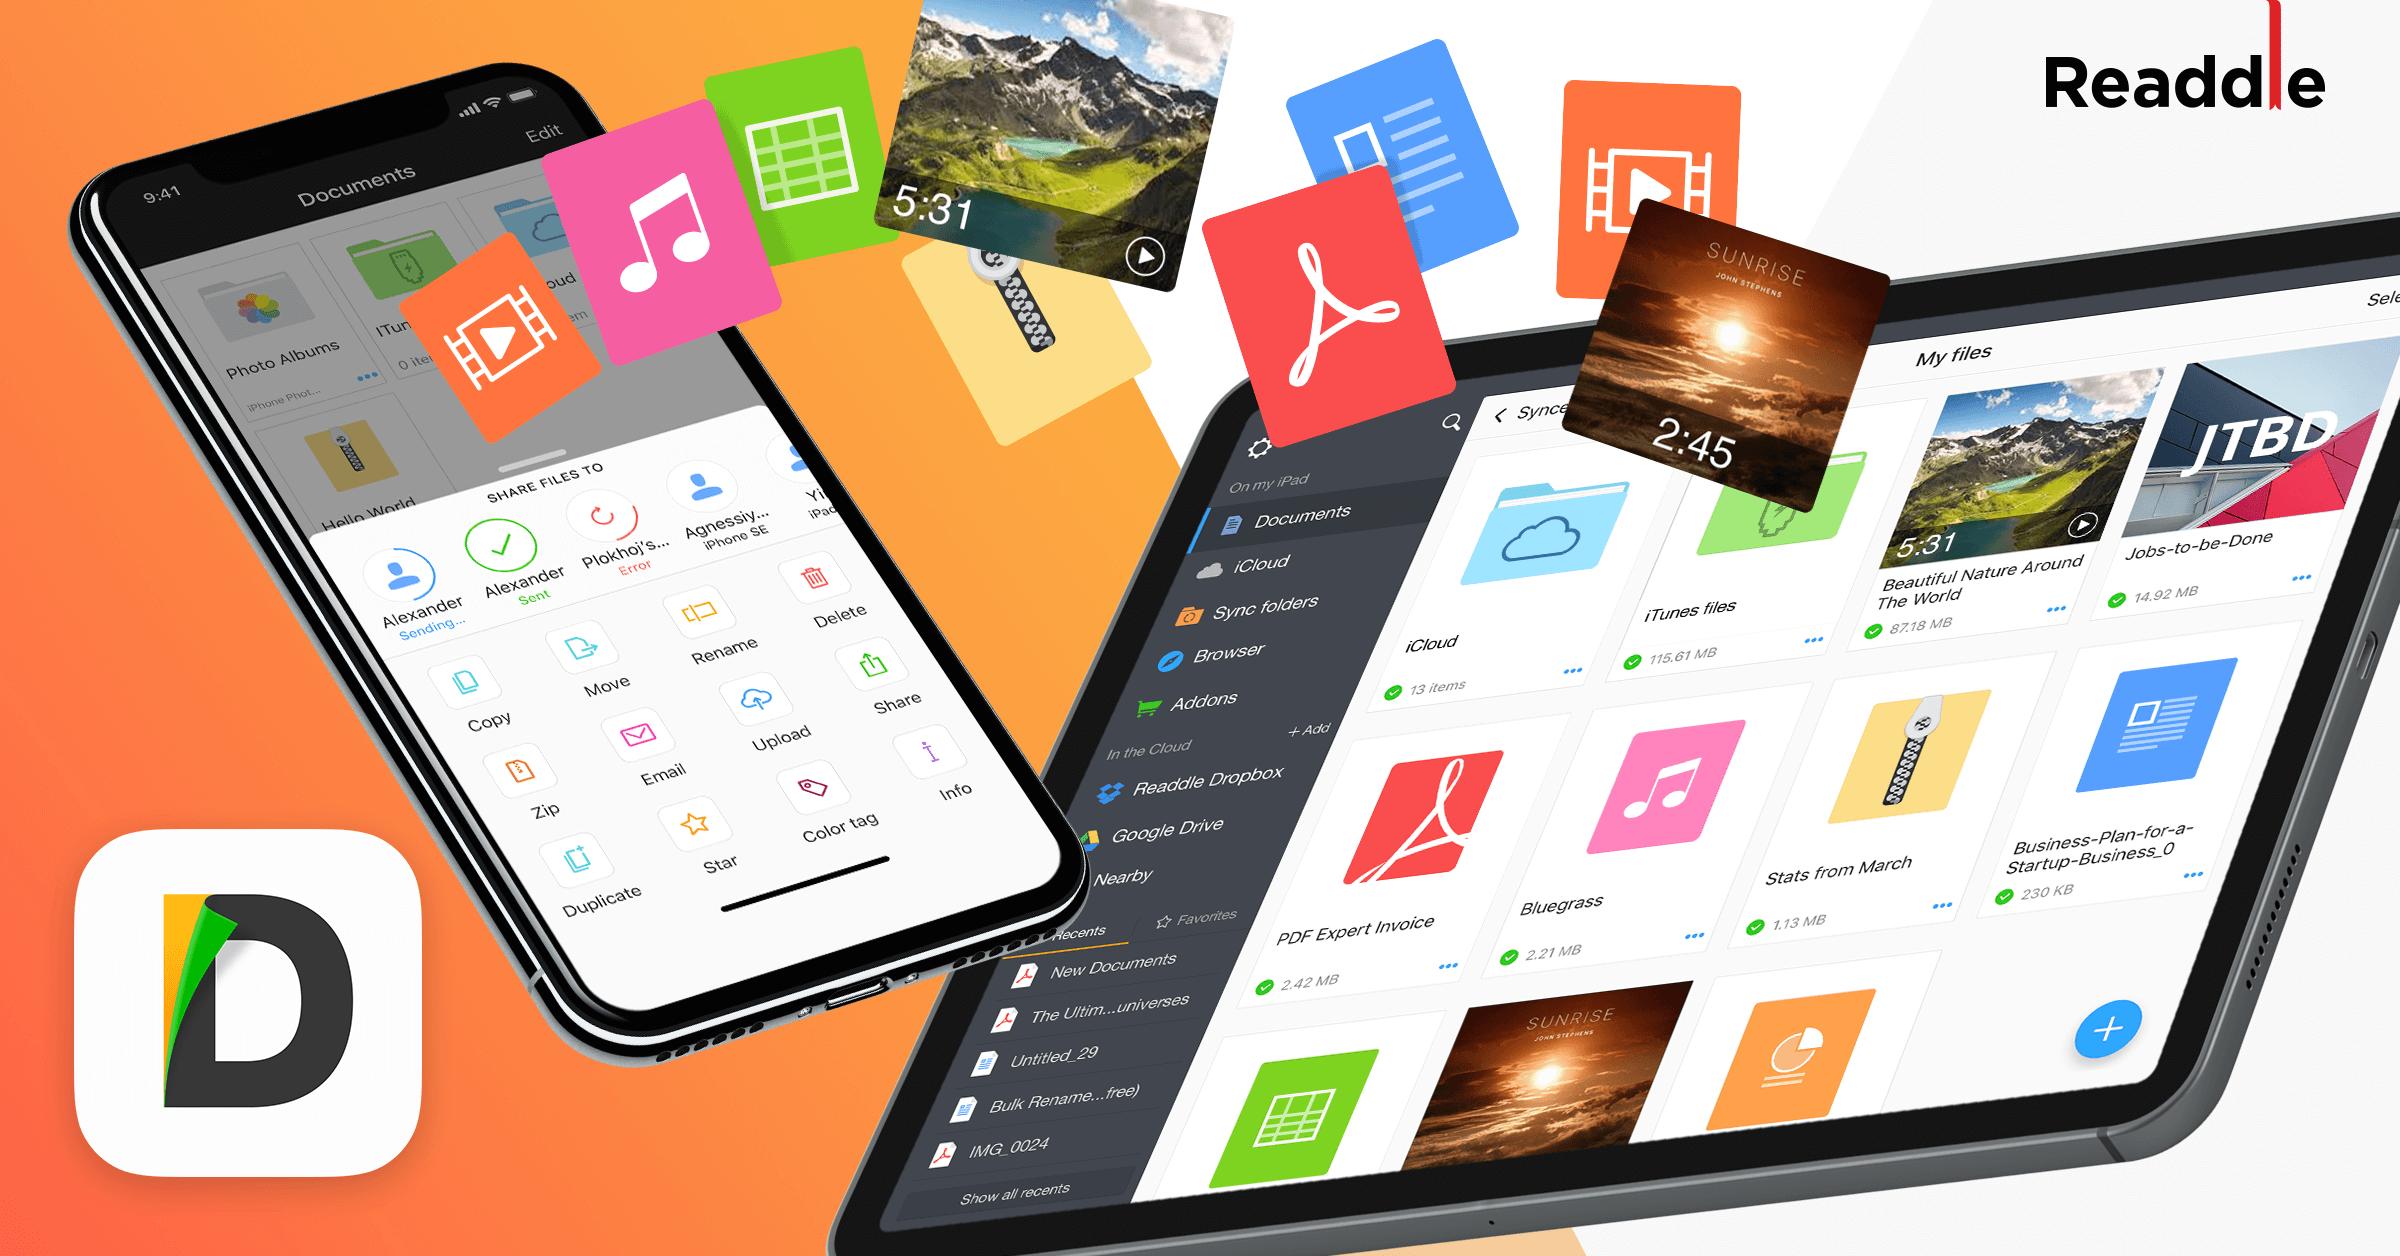 Documents App Brings FileDrop to Wirelessly Transfer Files